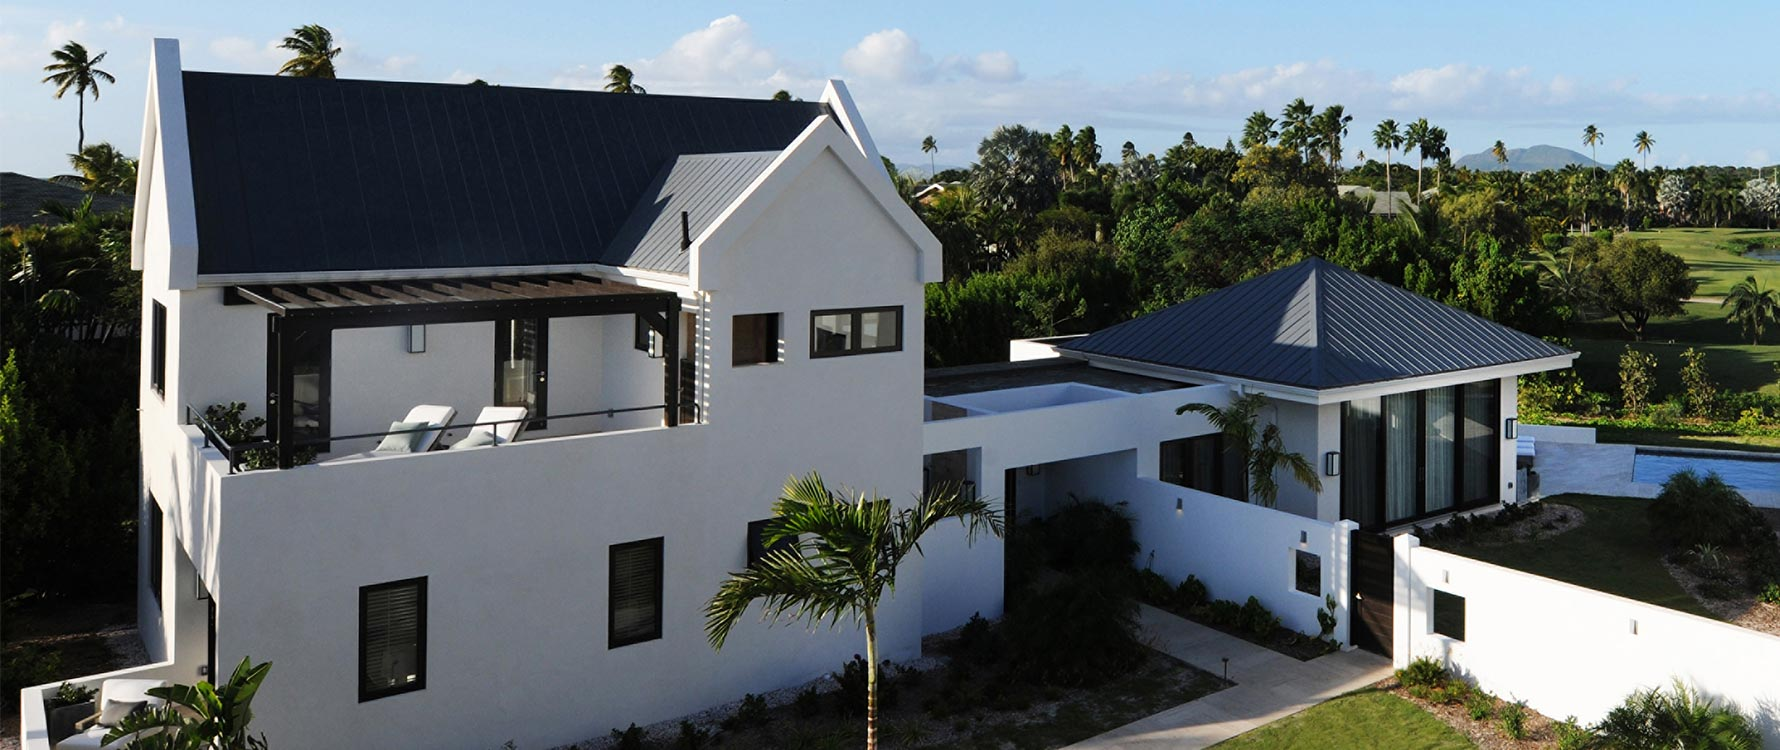 Overview shot of a Pinney's Beach Villa on Nevis